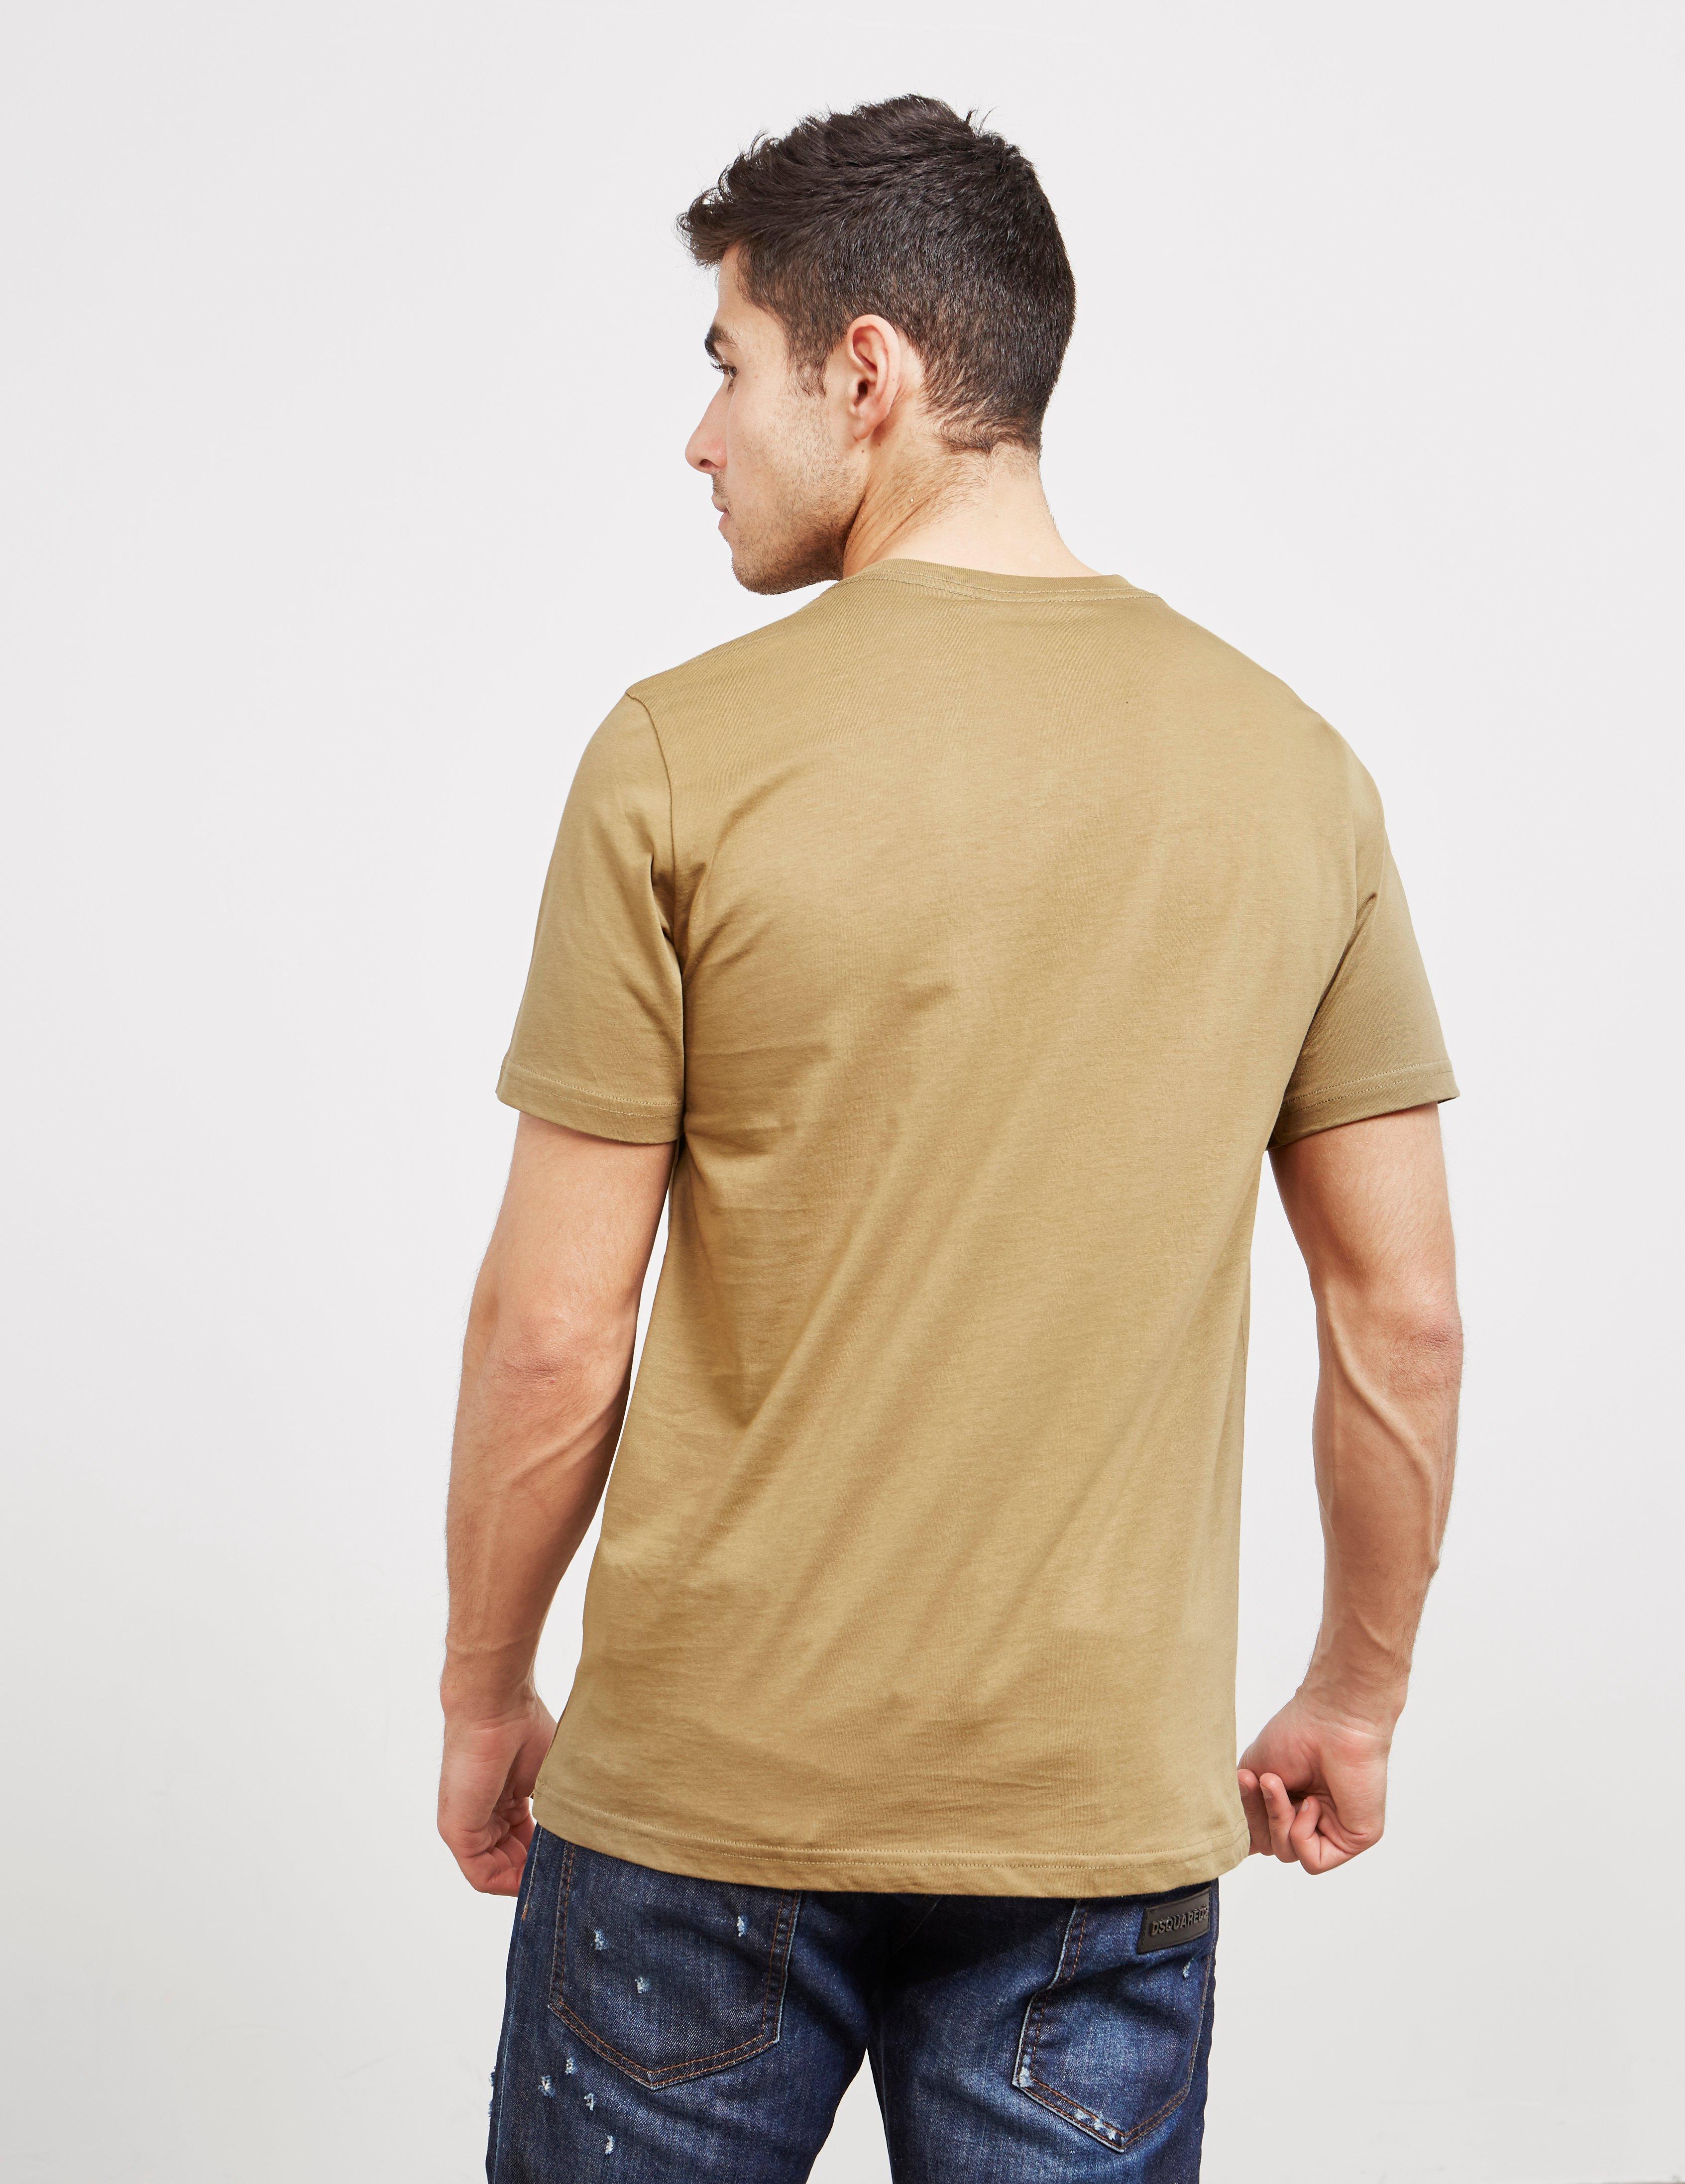 9b7b3d3d1 PS by Paul Smith - Basic Zebra Short Sleeve T-shirt Green for Men -. View  fullscreen